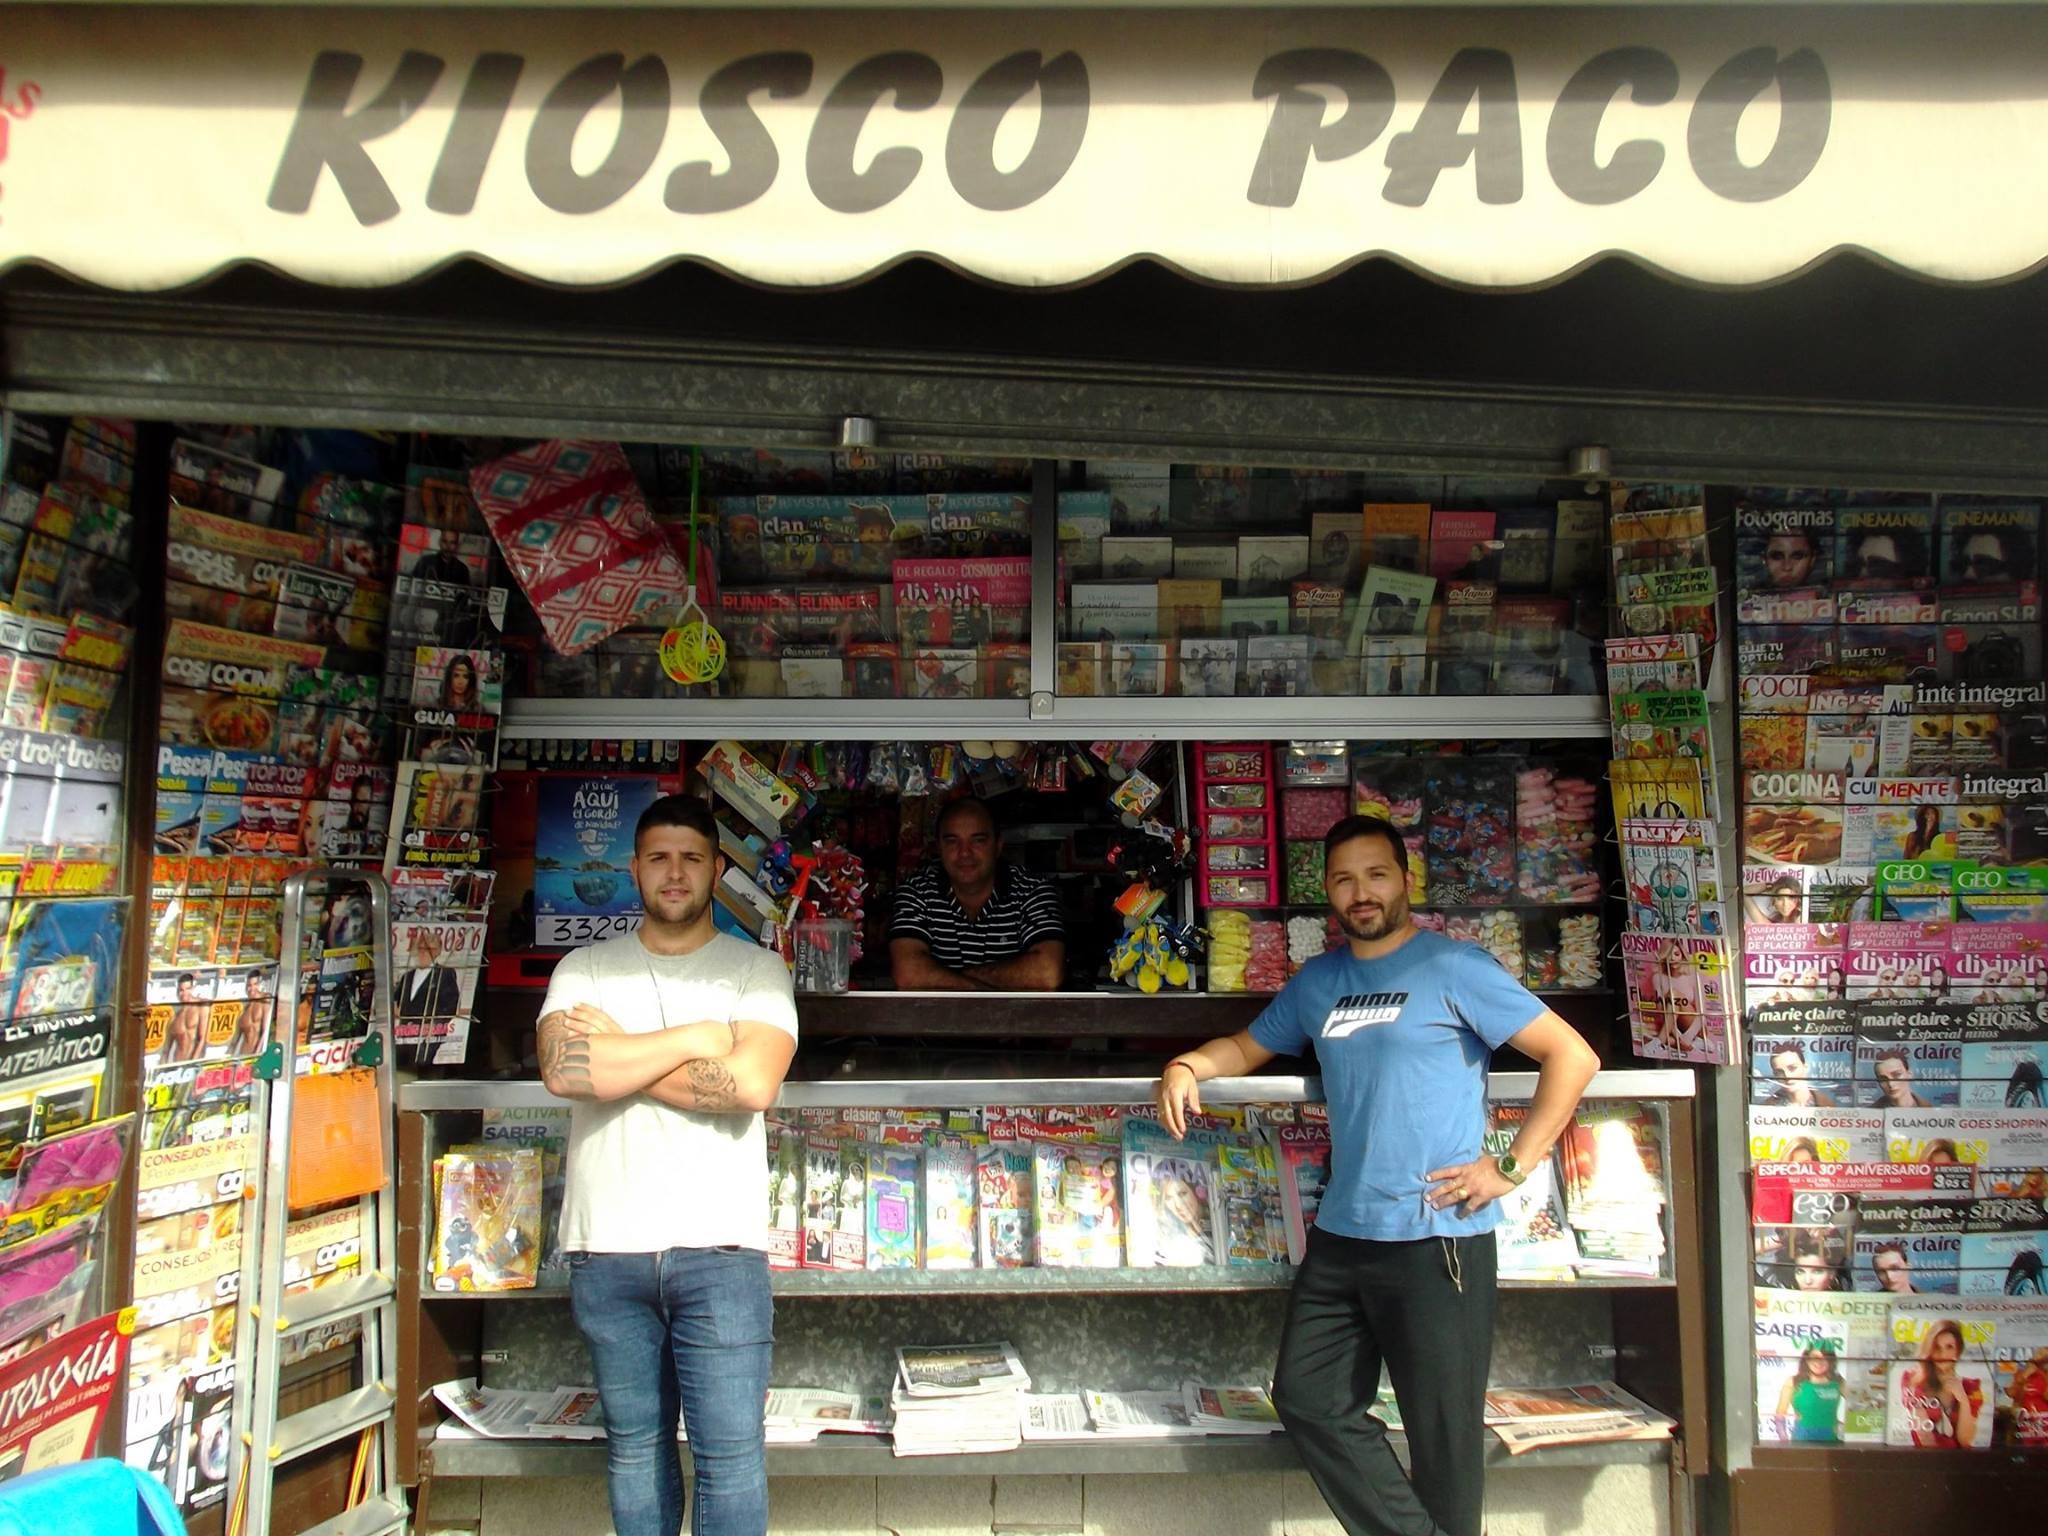 KIOSCO PACO